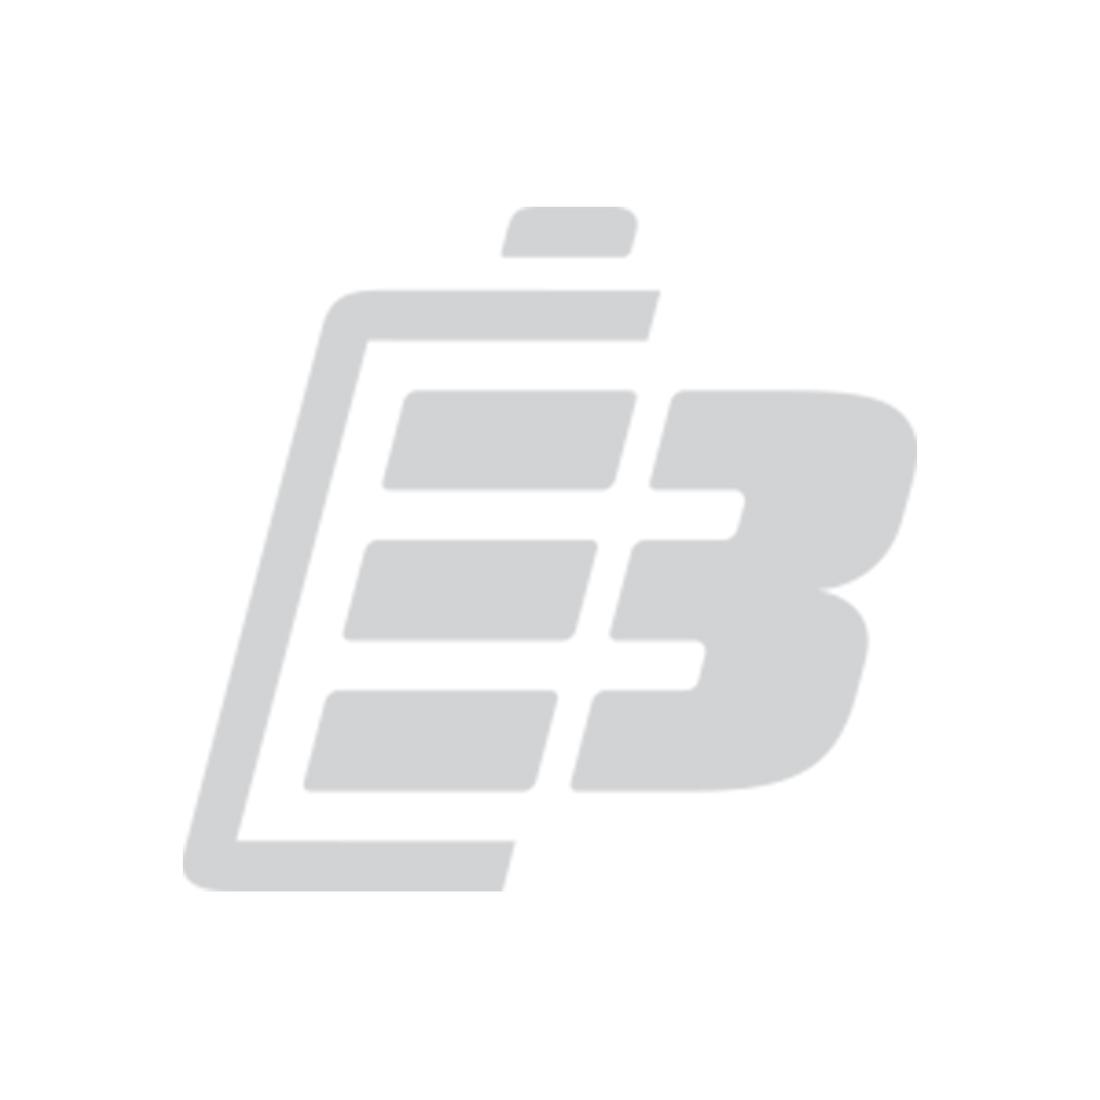 Olight Seeker 2 Pro LED Flashlight